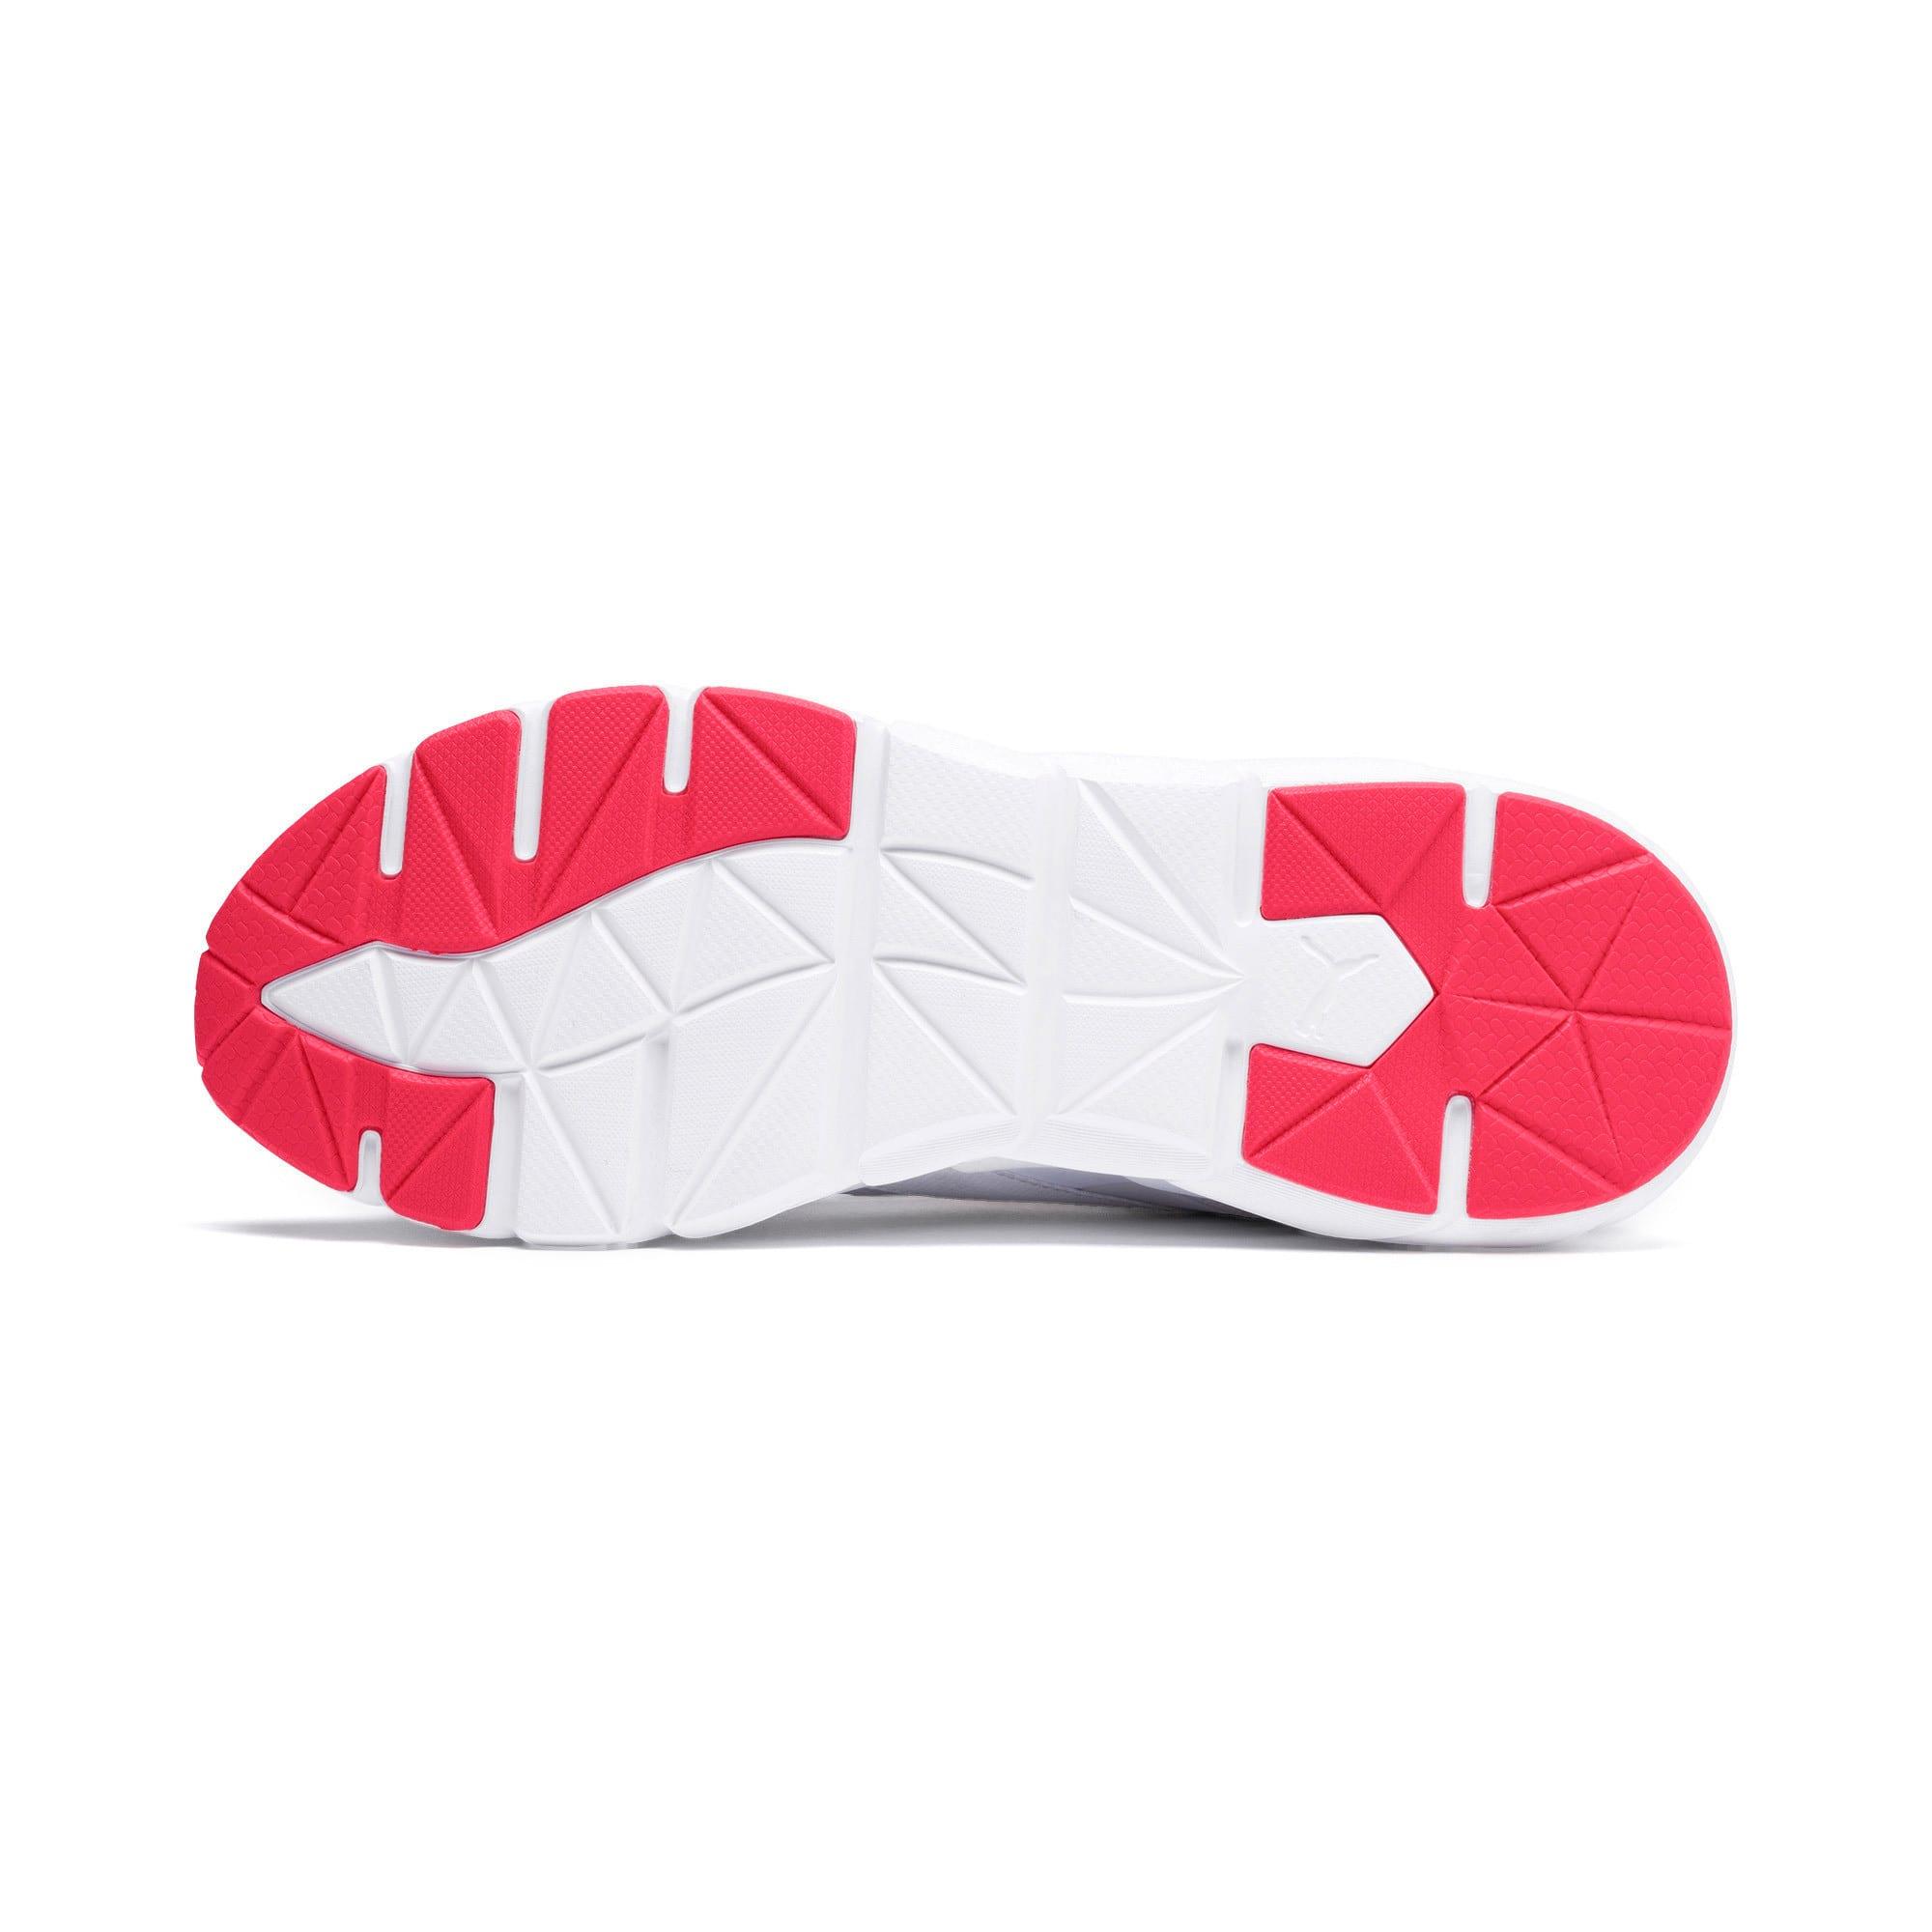 Thumbnail 7 of Weave XT Women's Training Shoes, Puma White-Pink Alert, medium-IND